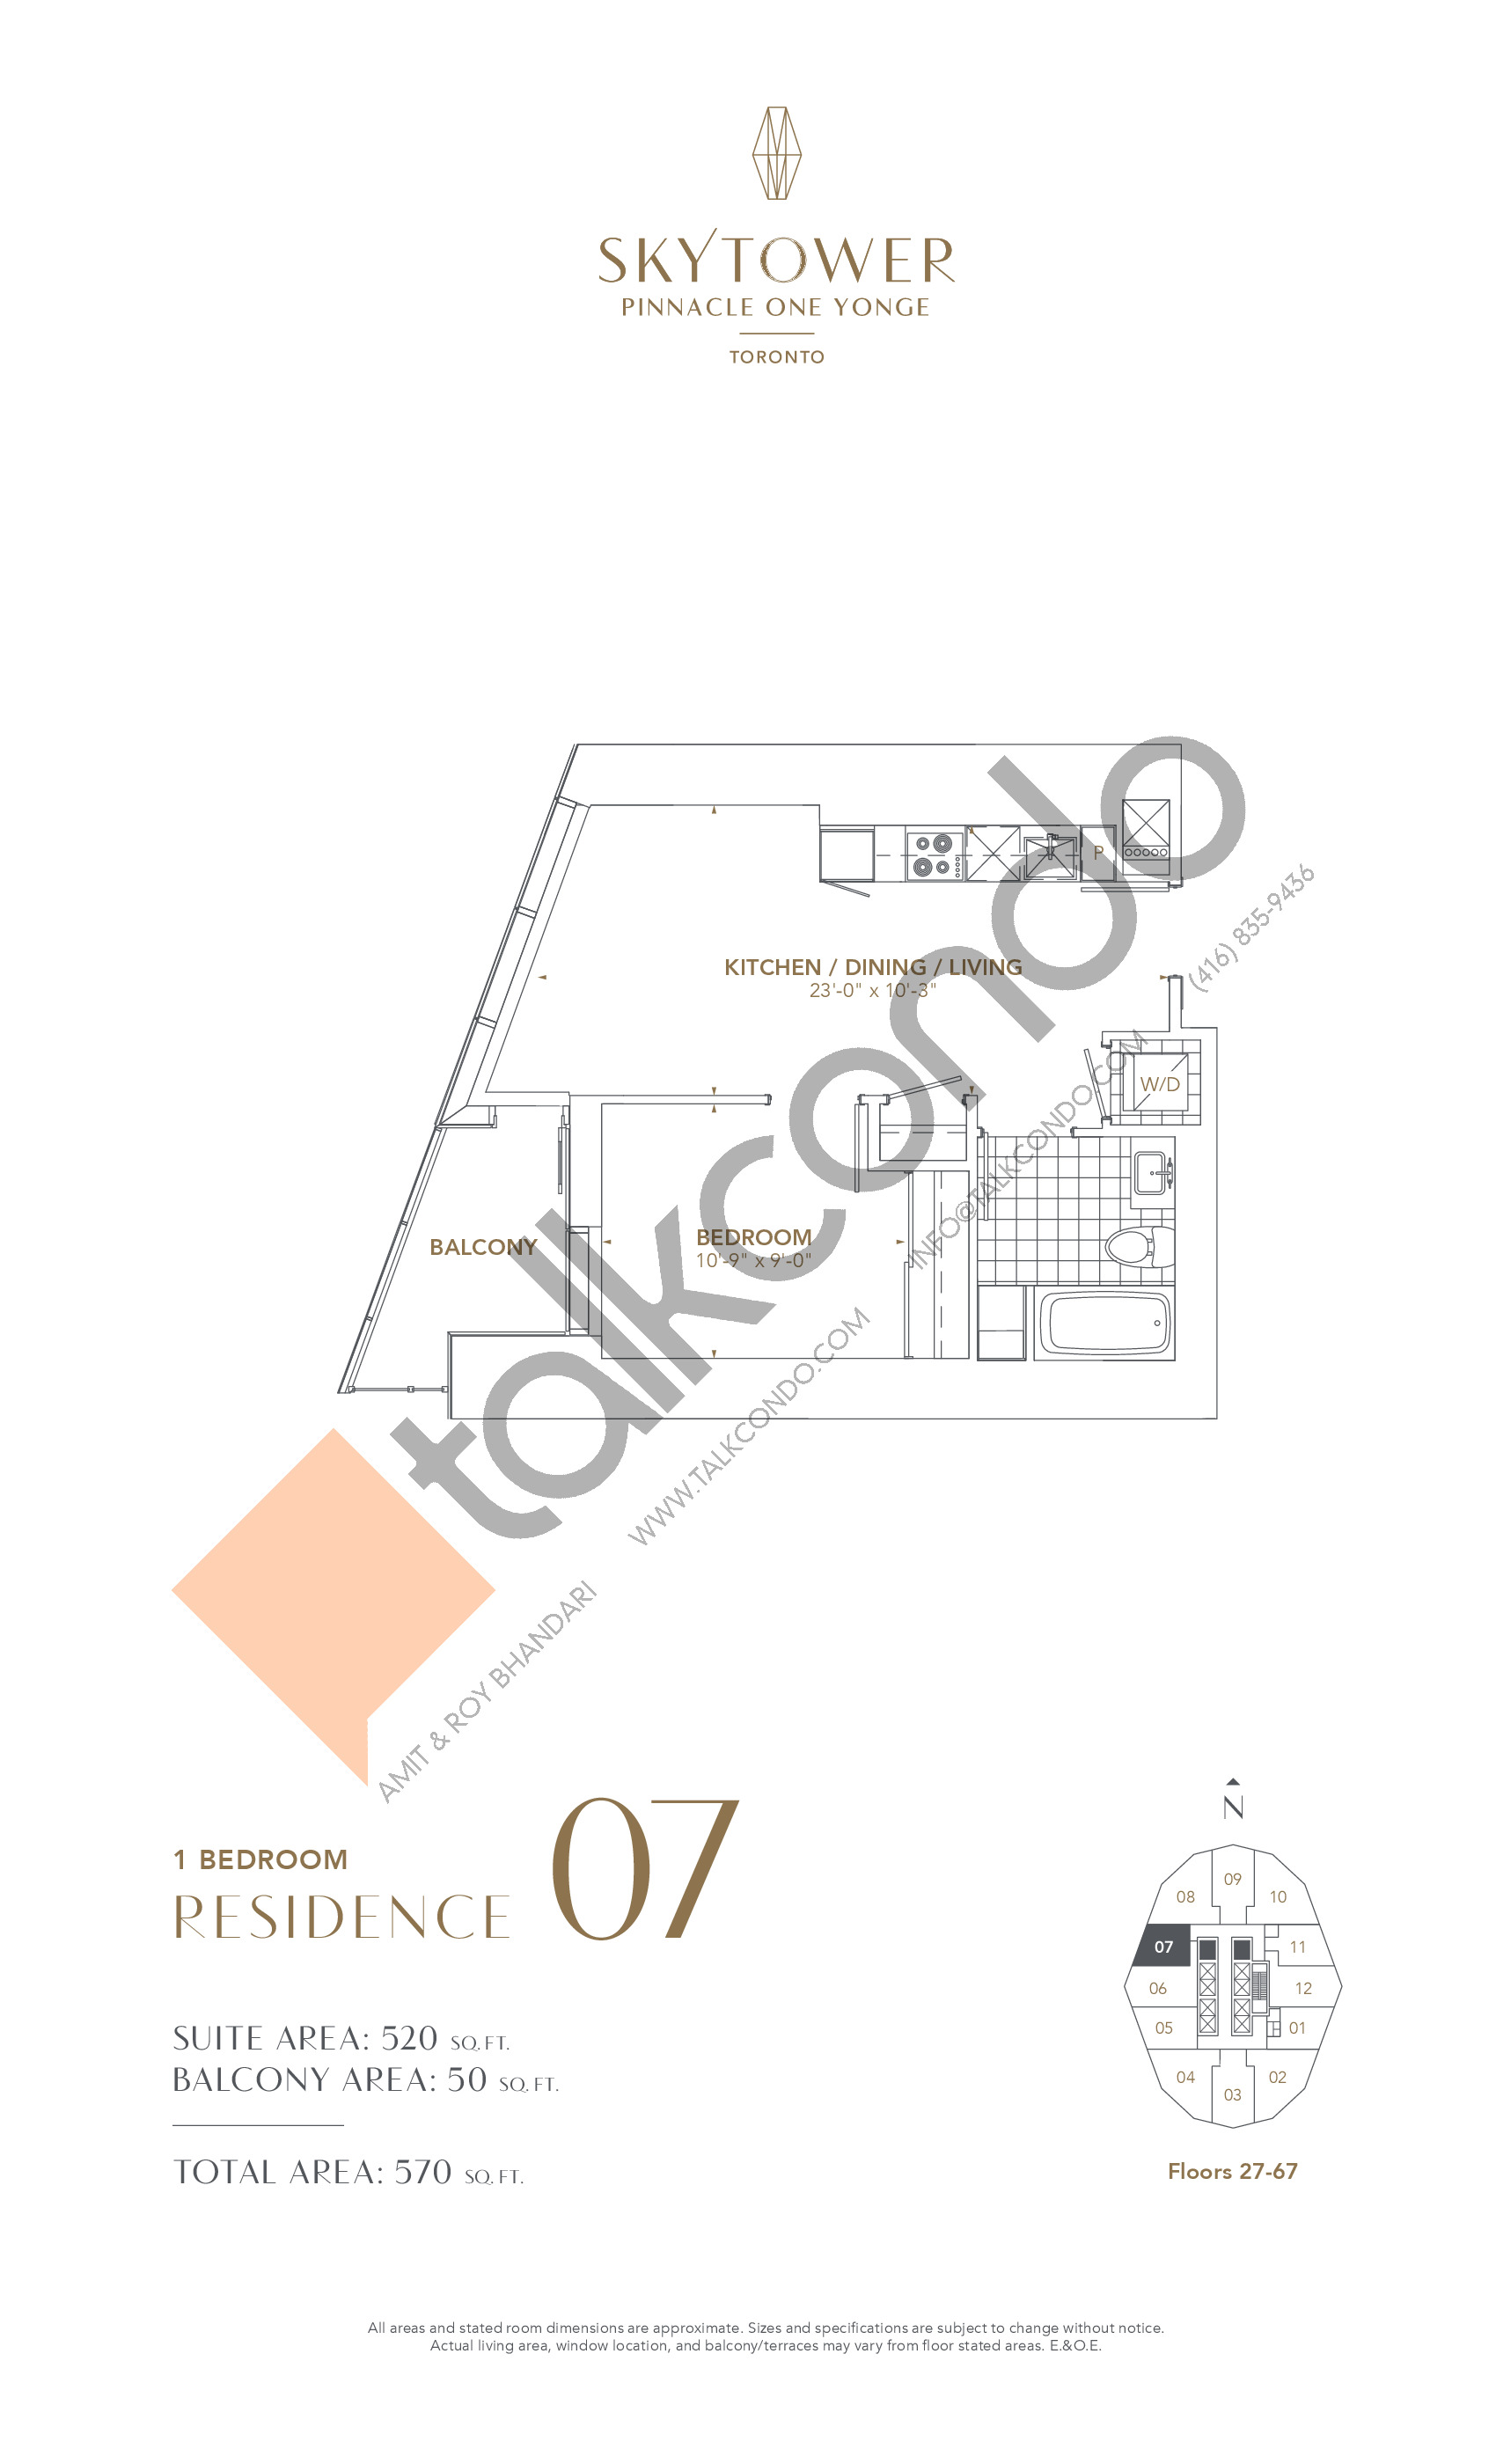 Residence 07 Floor Plan at SkyTower at Pinnacle One Yonge - 520 sq.ft